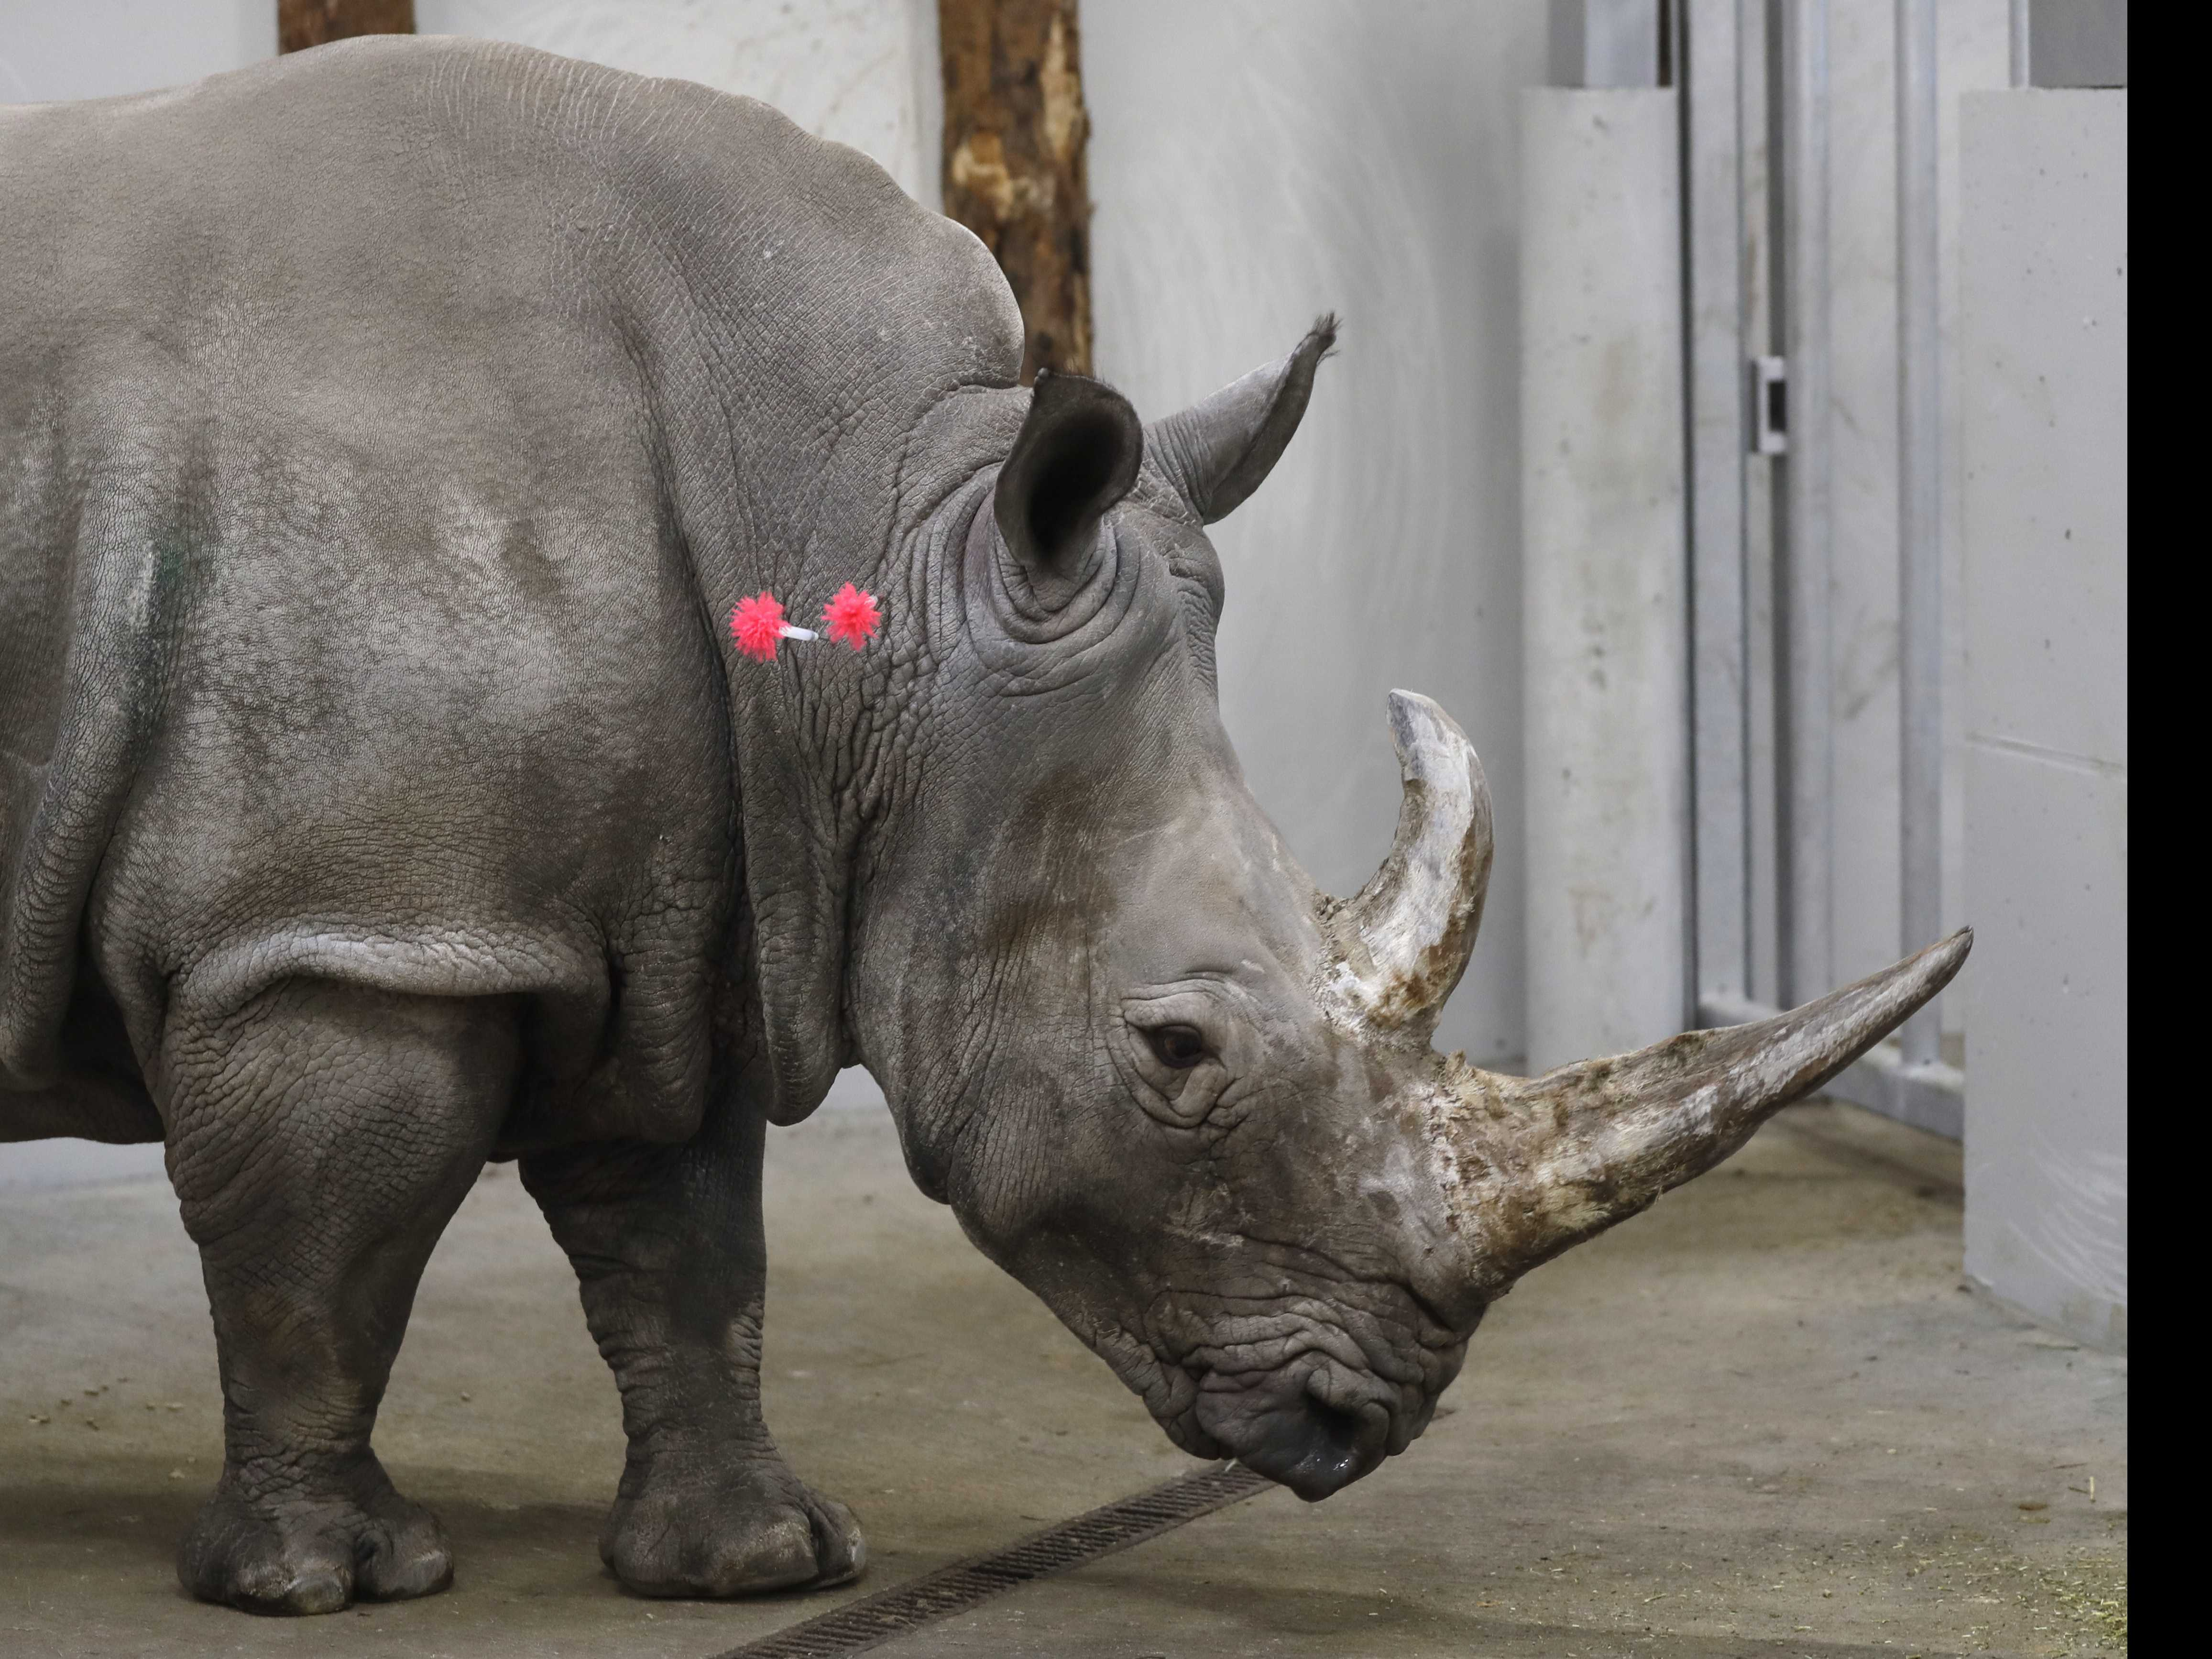 AP PHOTOS: Scientists Fine-Tune Method to Save Rhinos